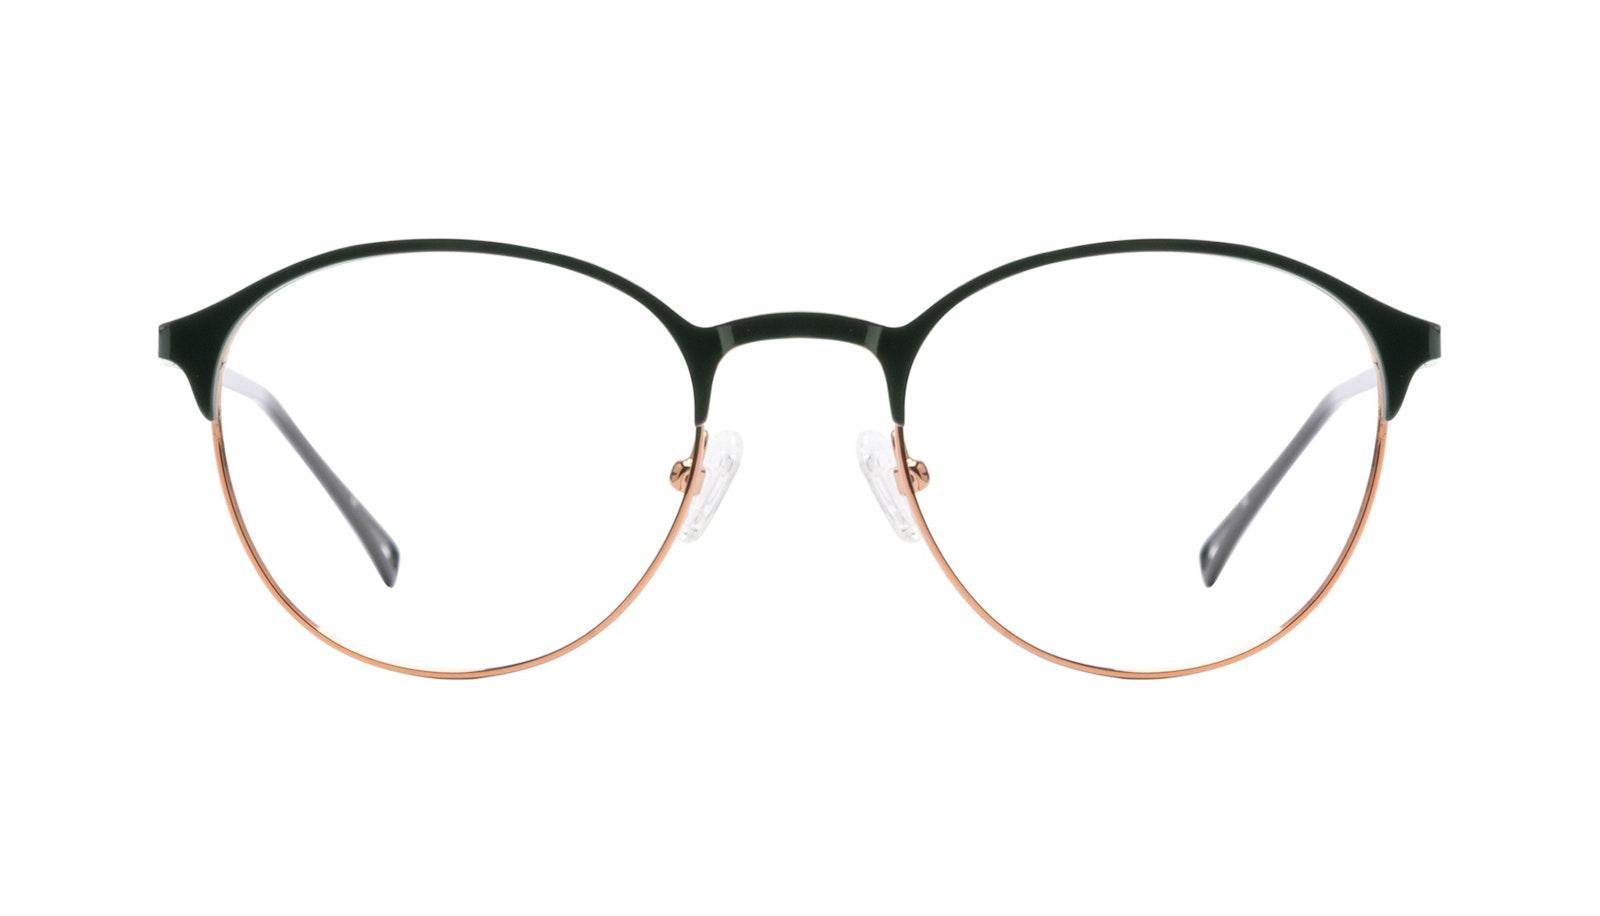 Affordable Fashion Glasses Round Eyeglasses Women Bay Emeraude